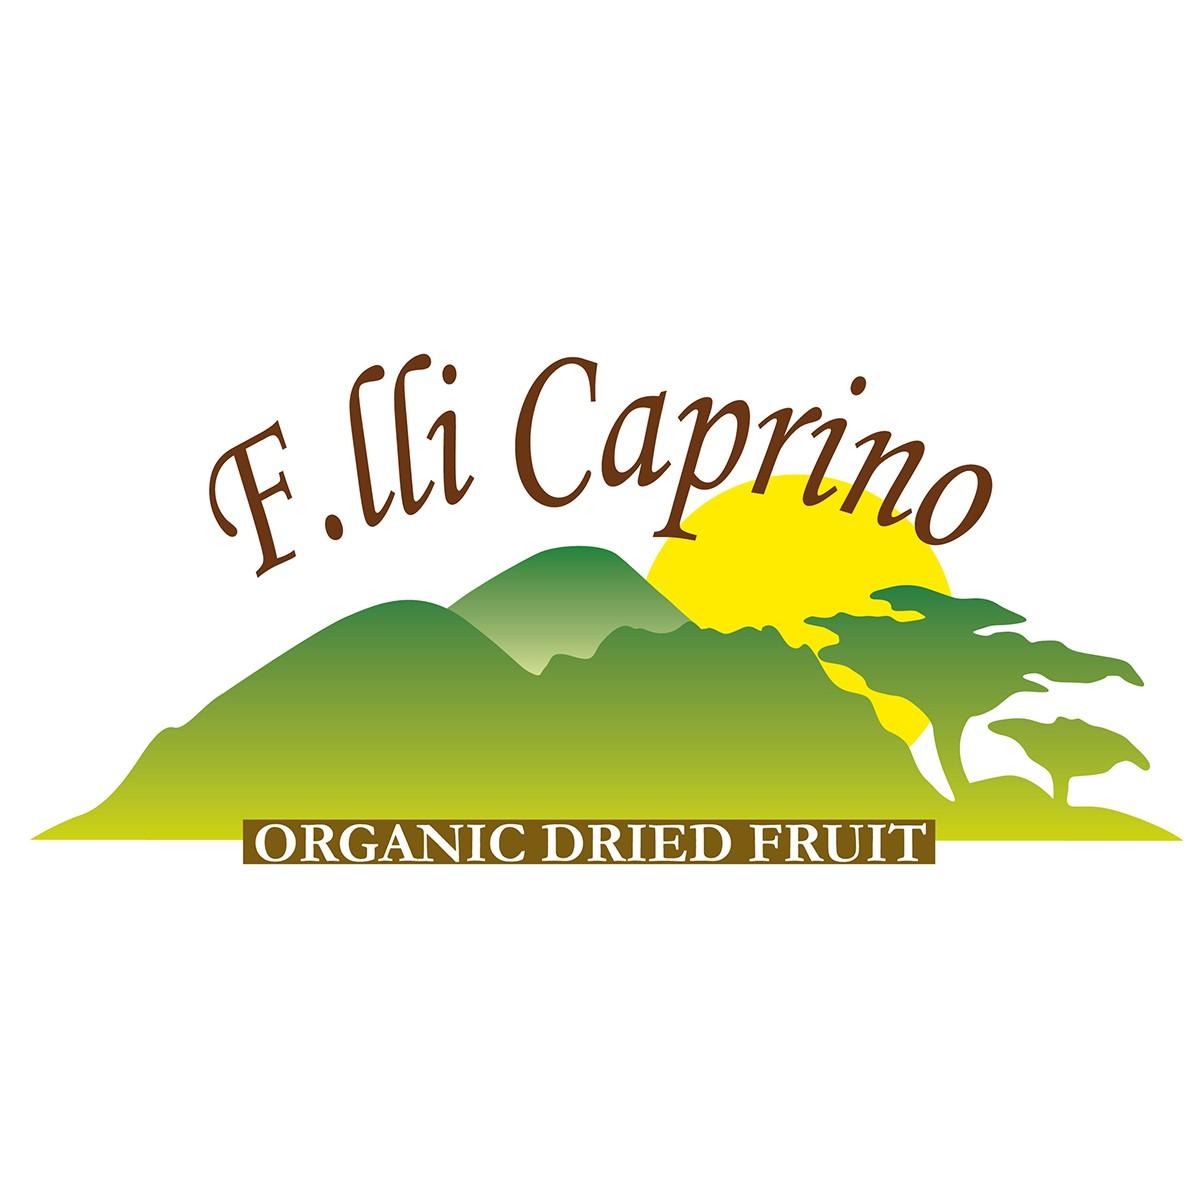 F.LLI CAPRINO SRL